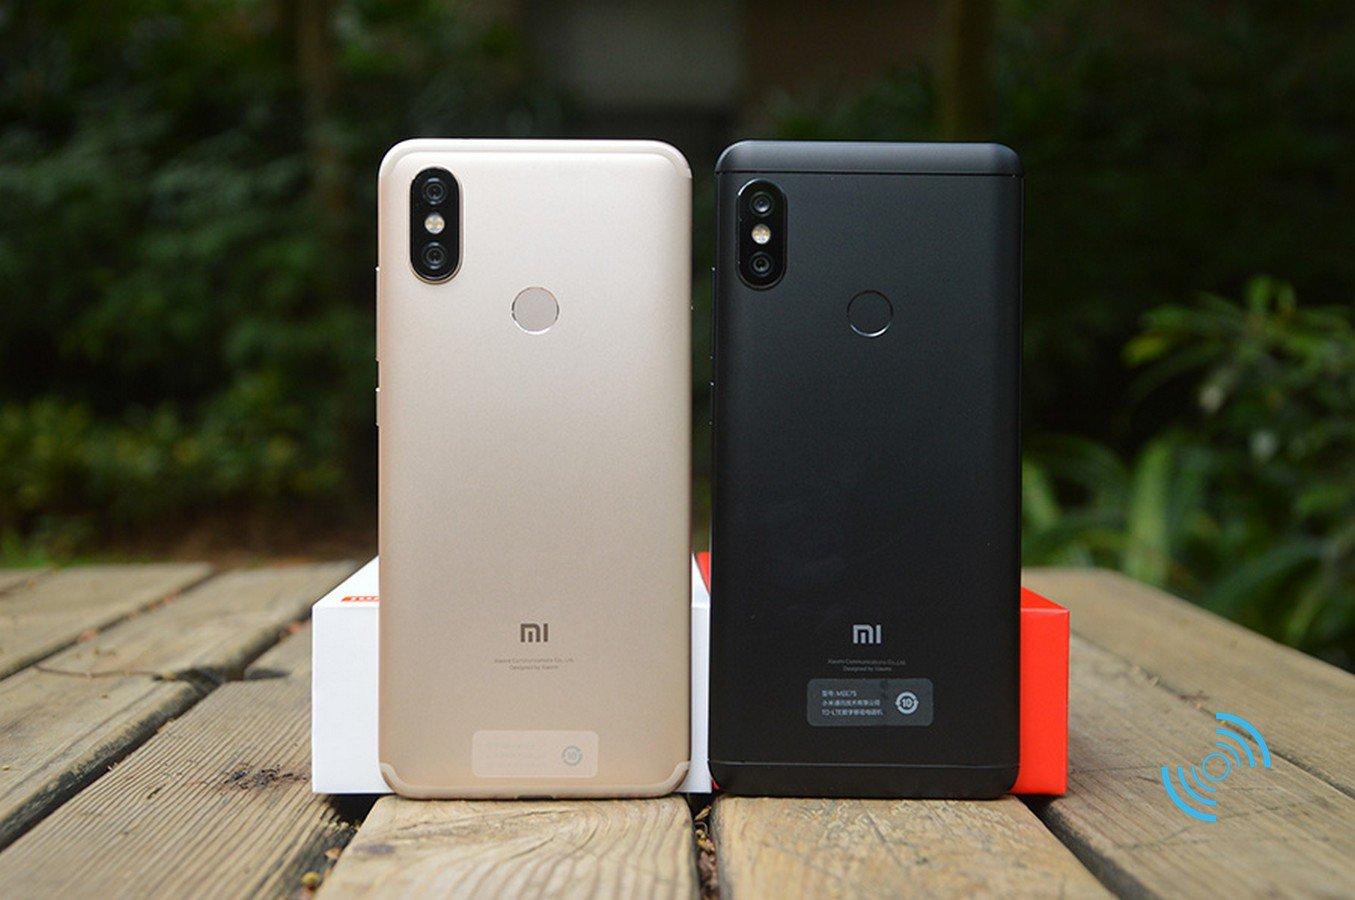 Xiaomi mi 6x contro redmi nota 5 cina camera shootout: fa mi 6x